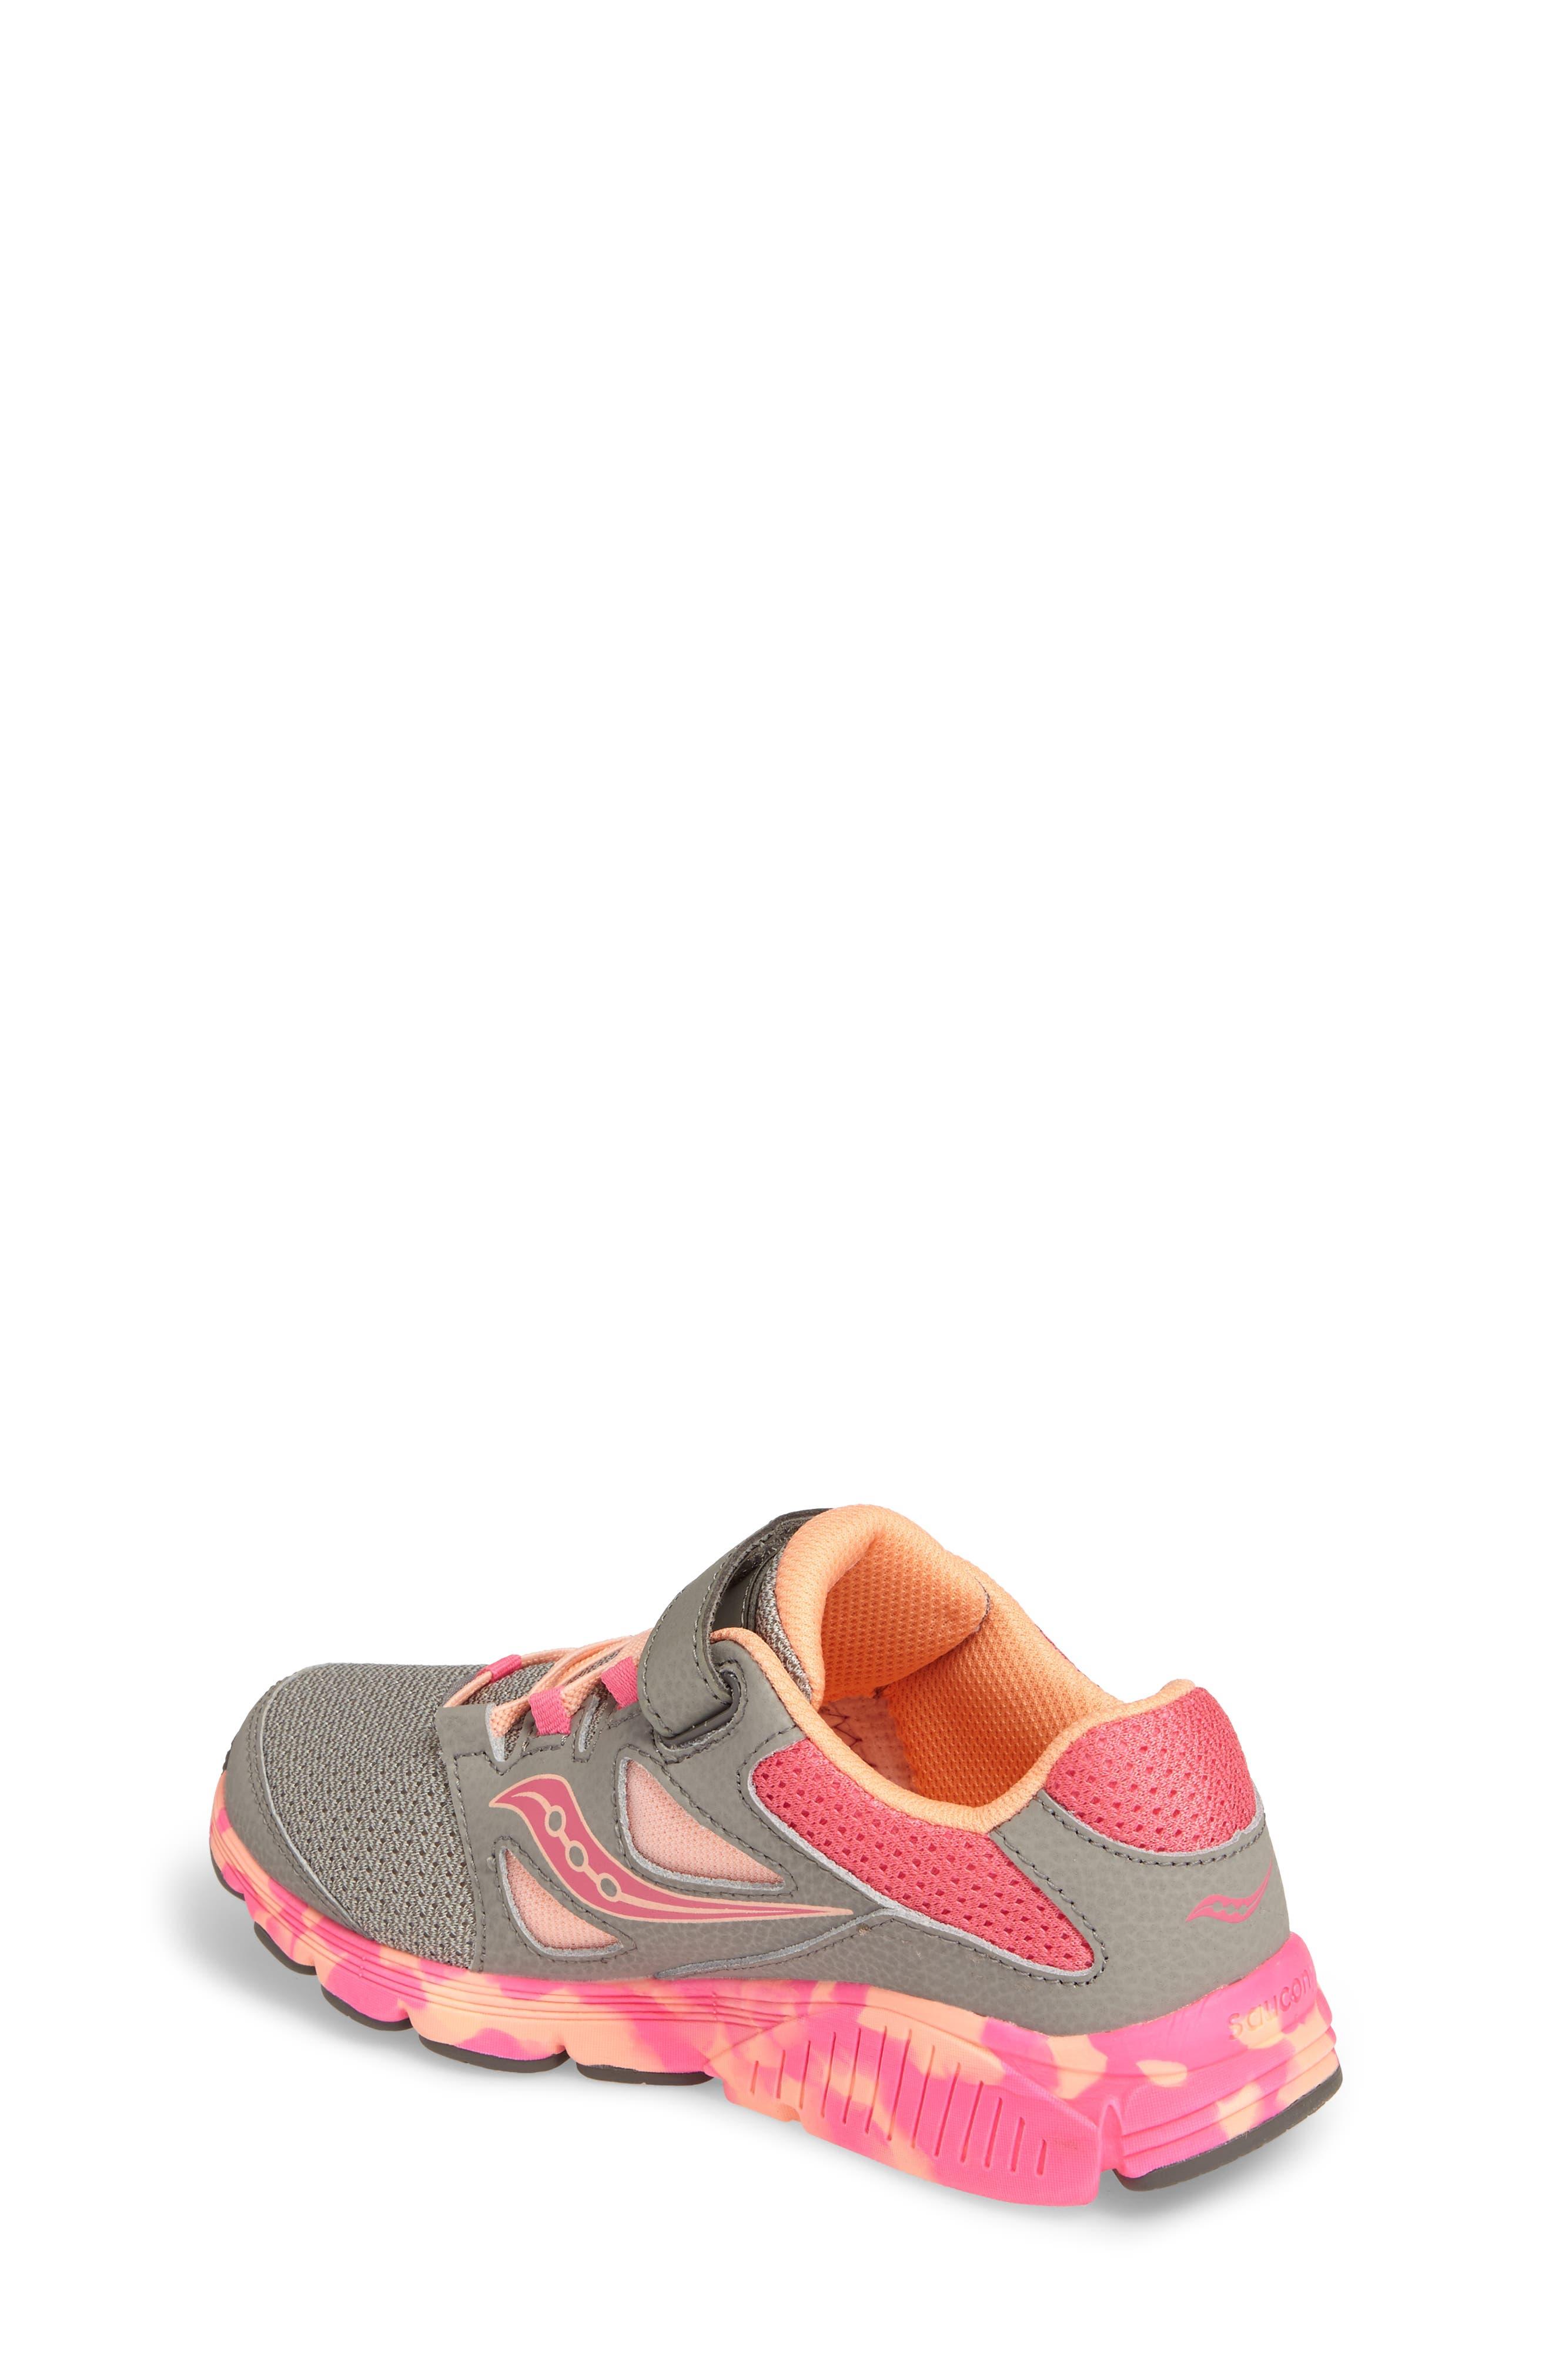 Kotaro 4 Sneaker,                             Alternate thumbnail 2, color,                             020